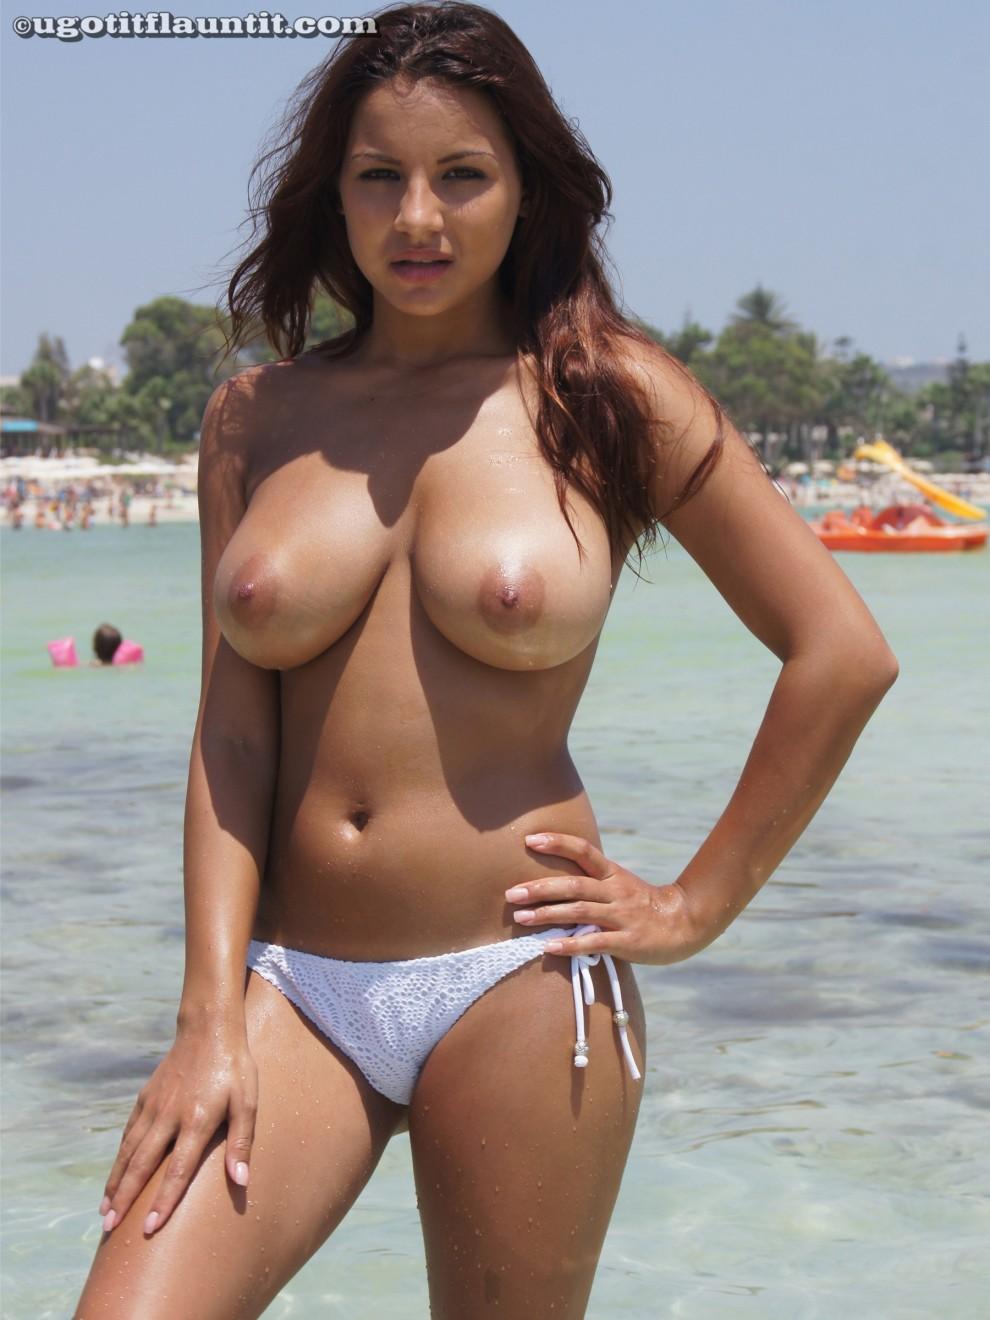 Lacey Banghard in white bikini bottoms (X-post /r/Lacey_Banghard)